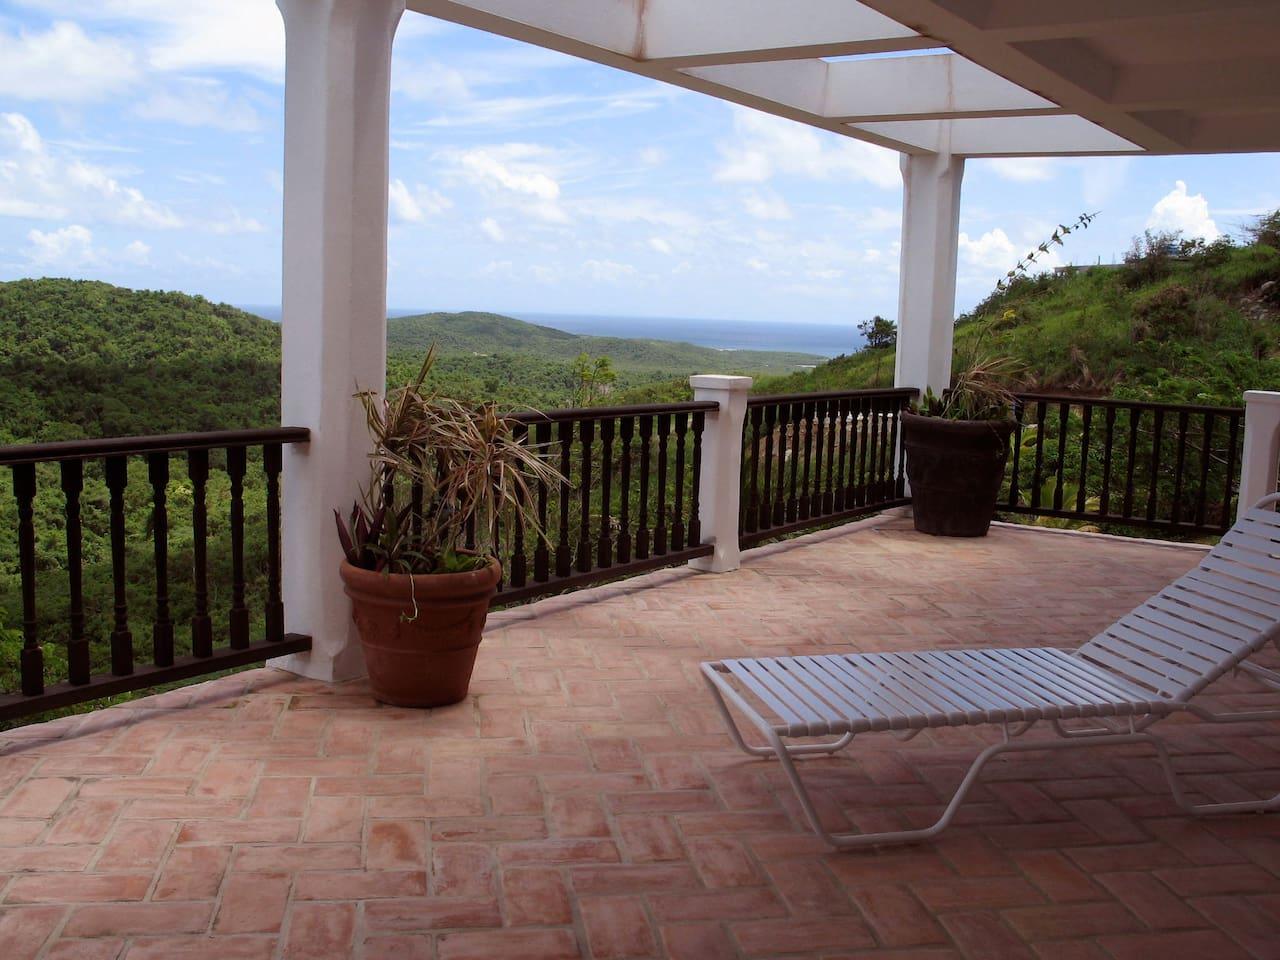 Back terrace looking southeast towards St. Croix